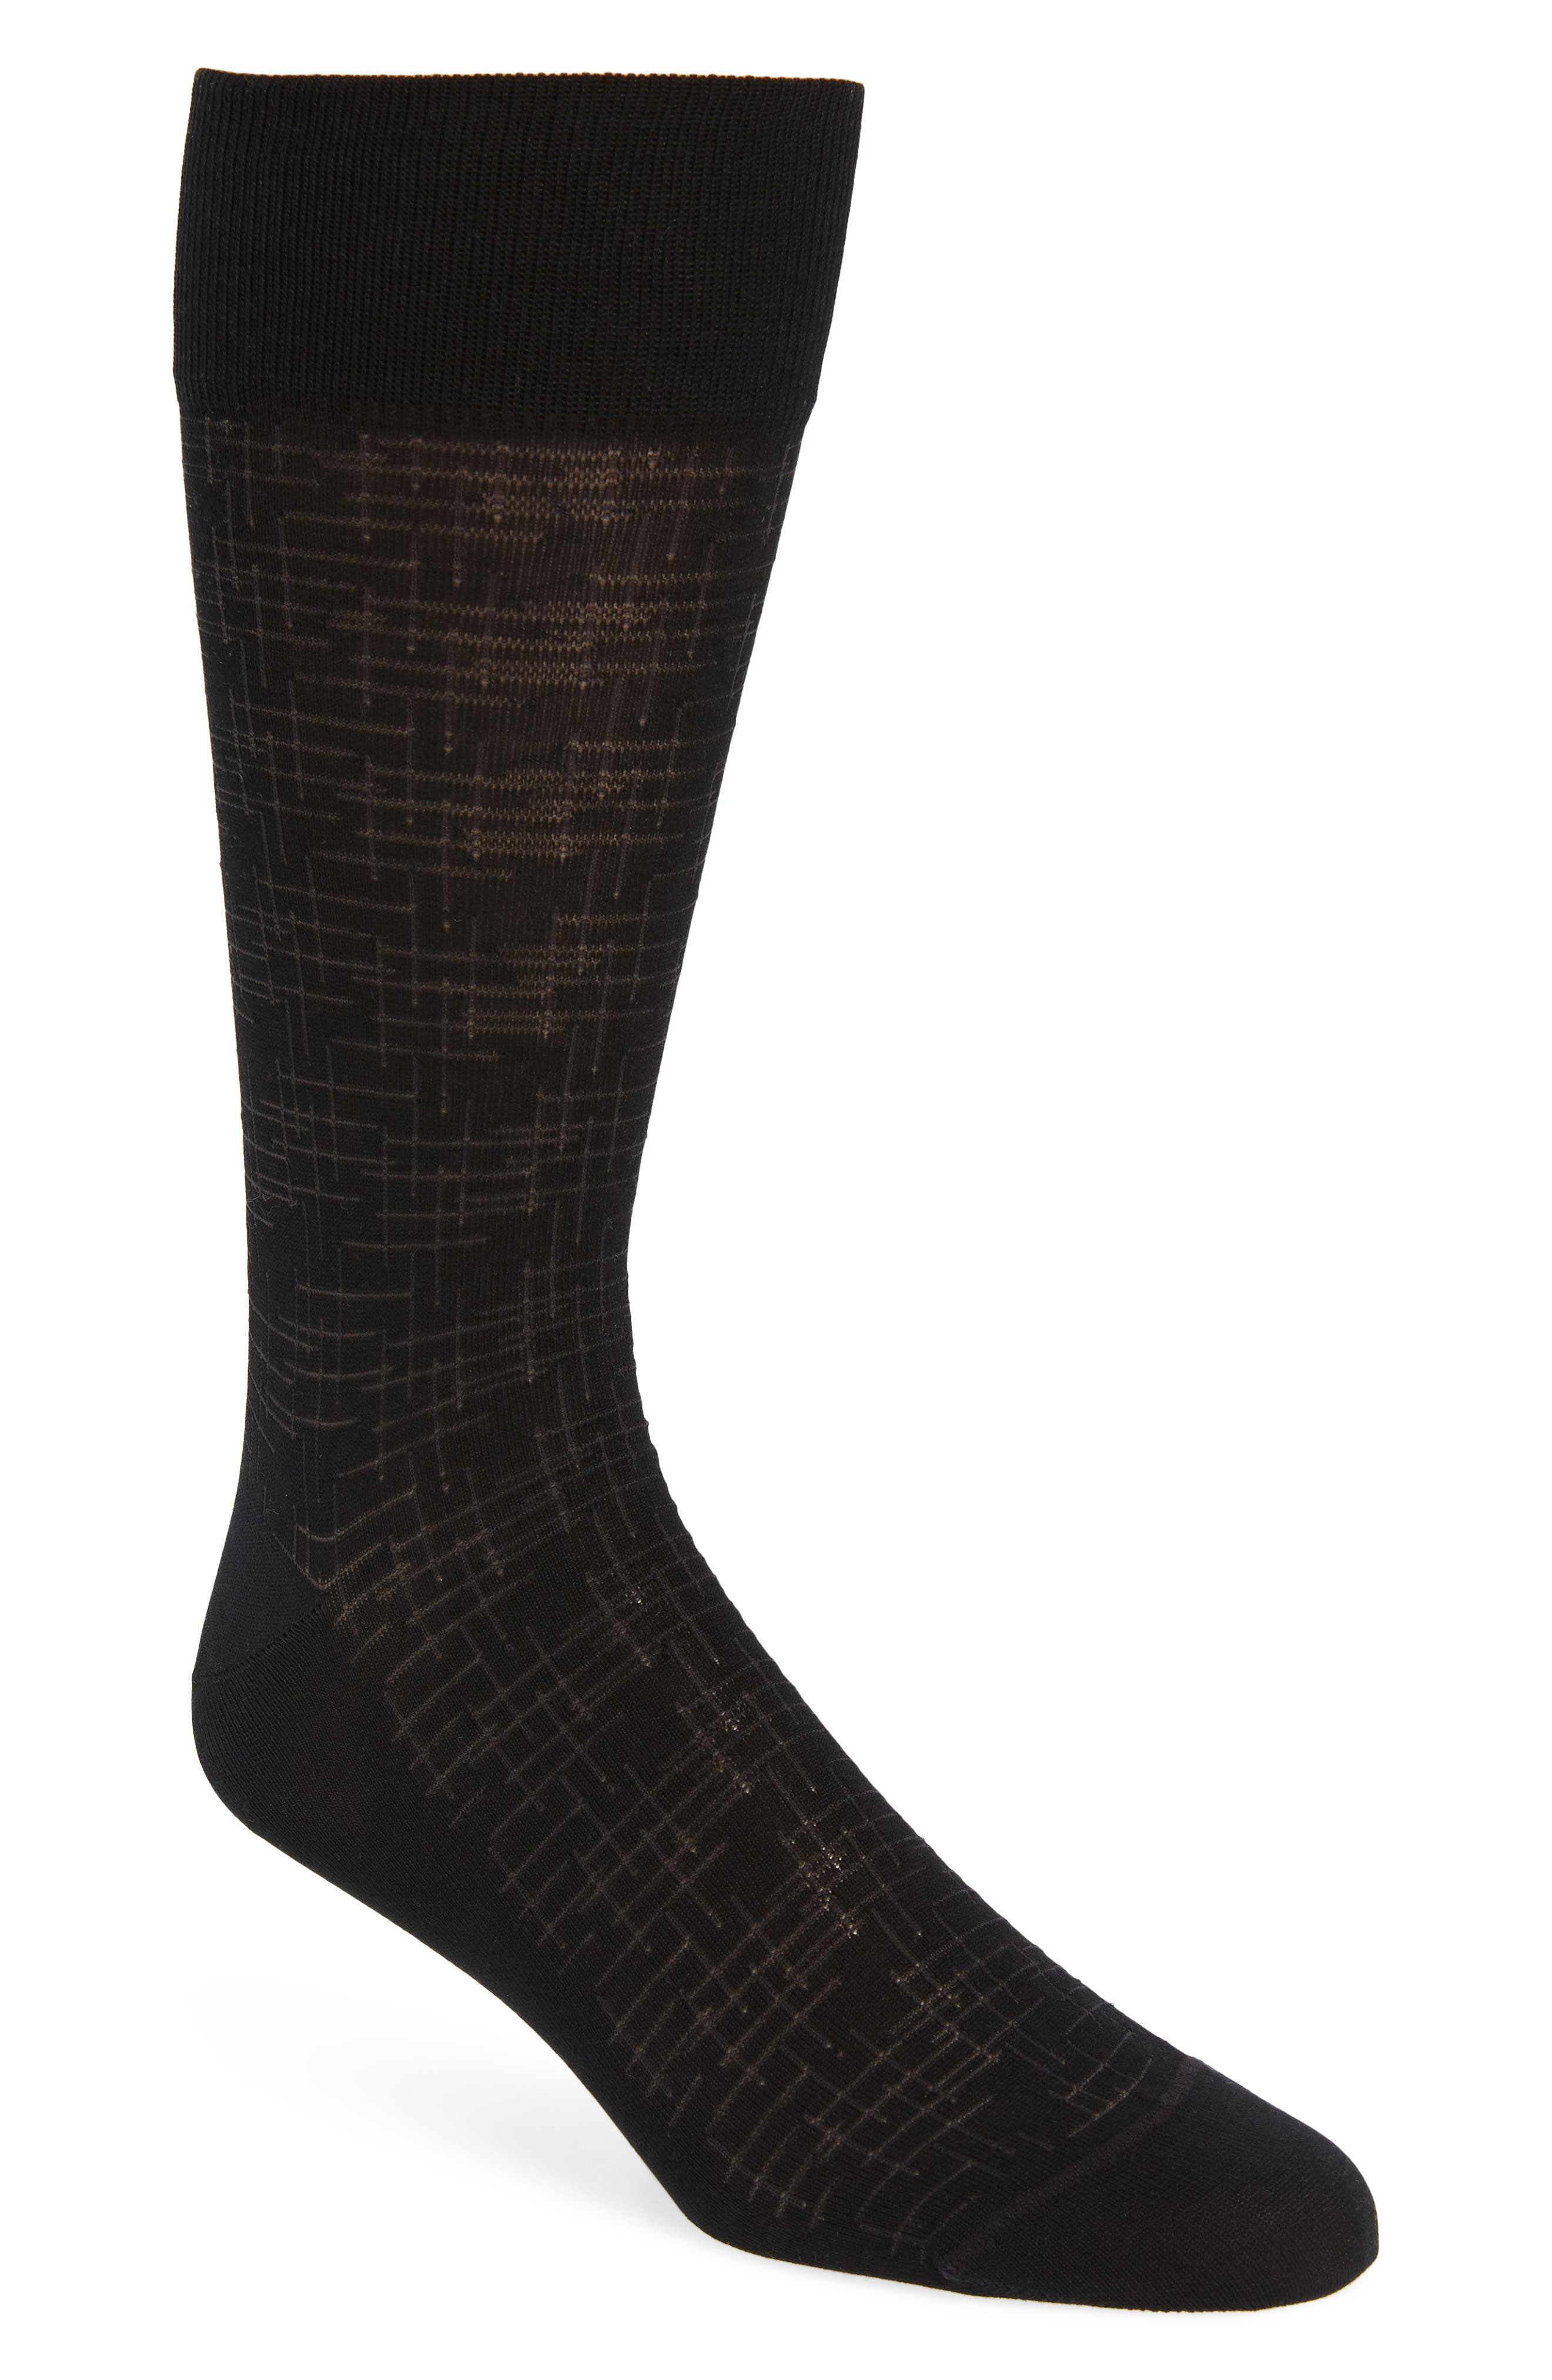 Crosshatch Socks,                         Main,                         color, Black/ Charcoal